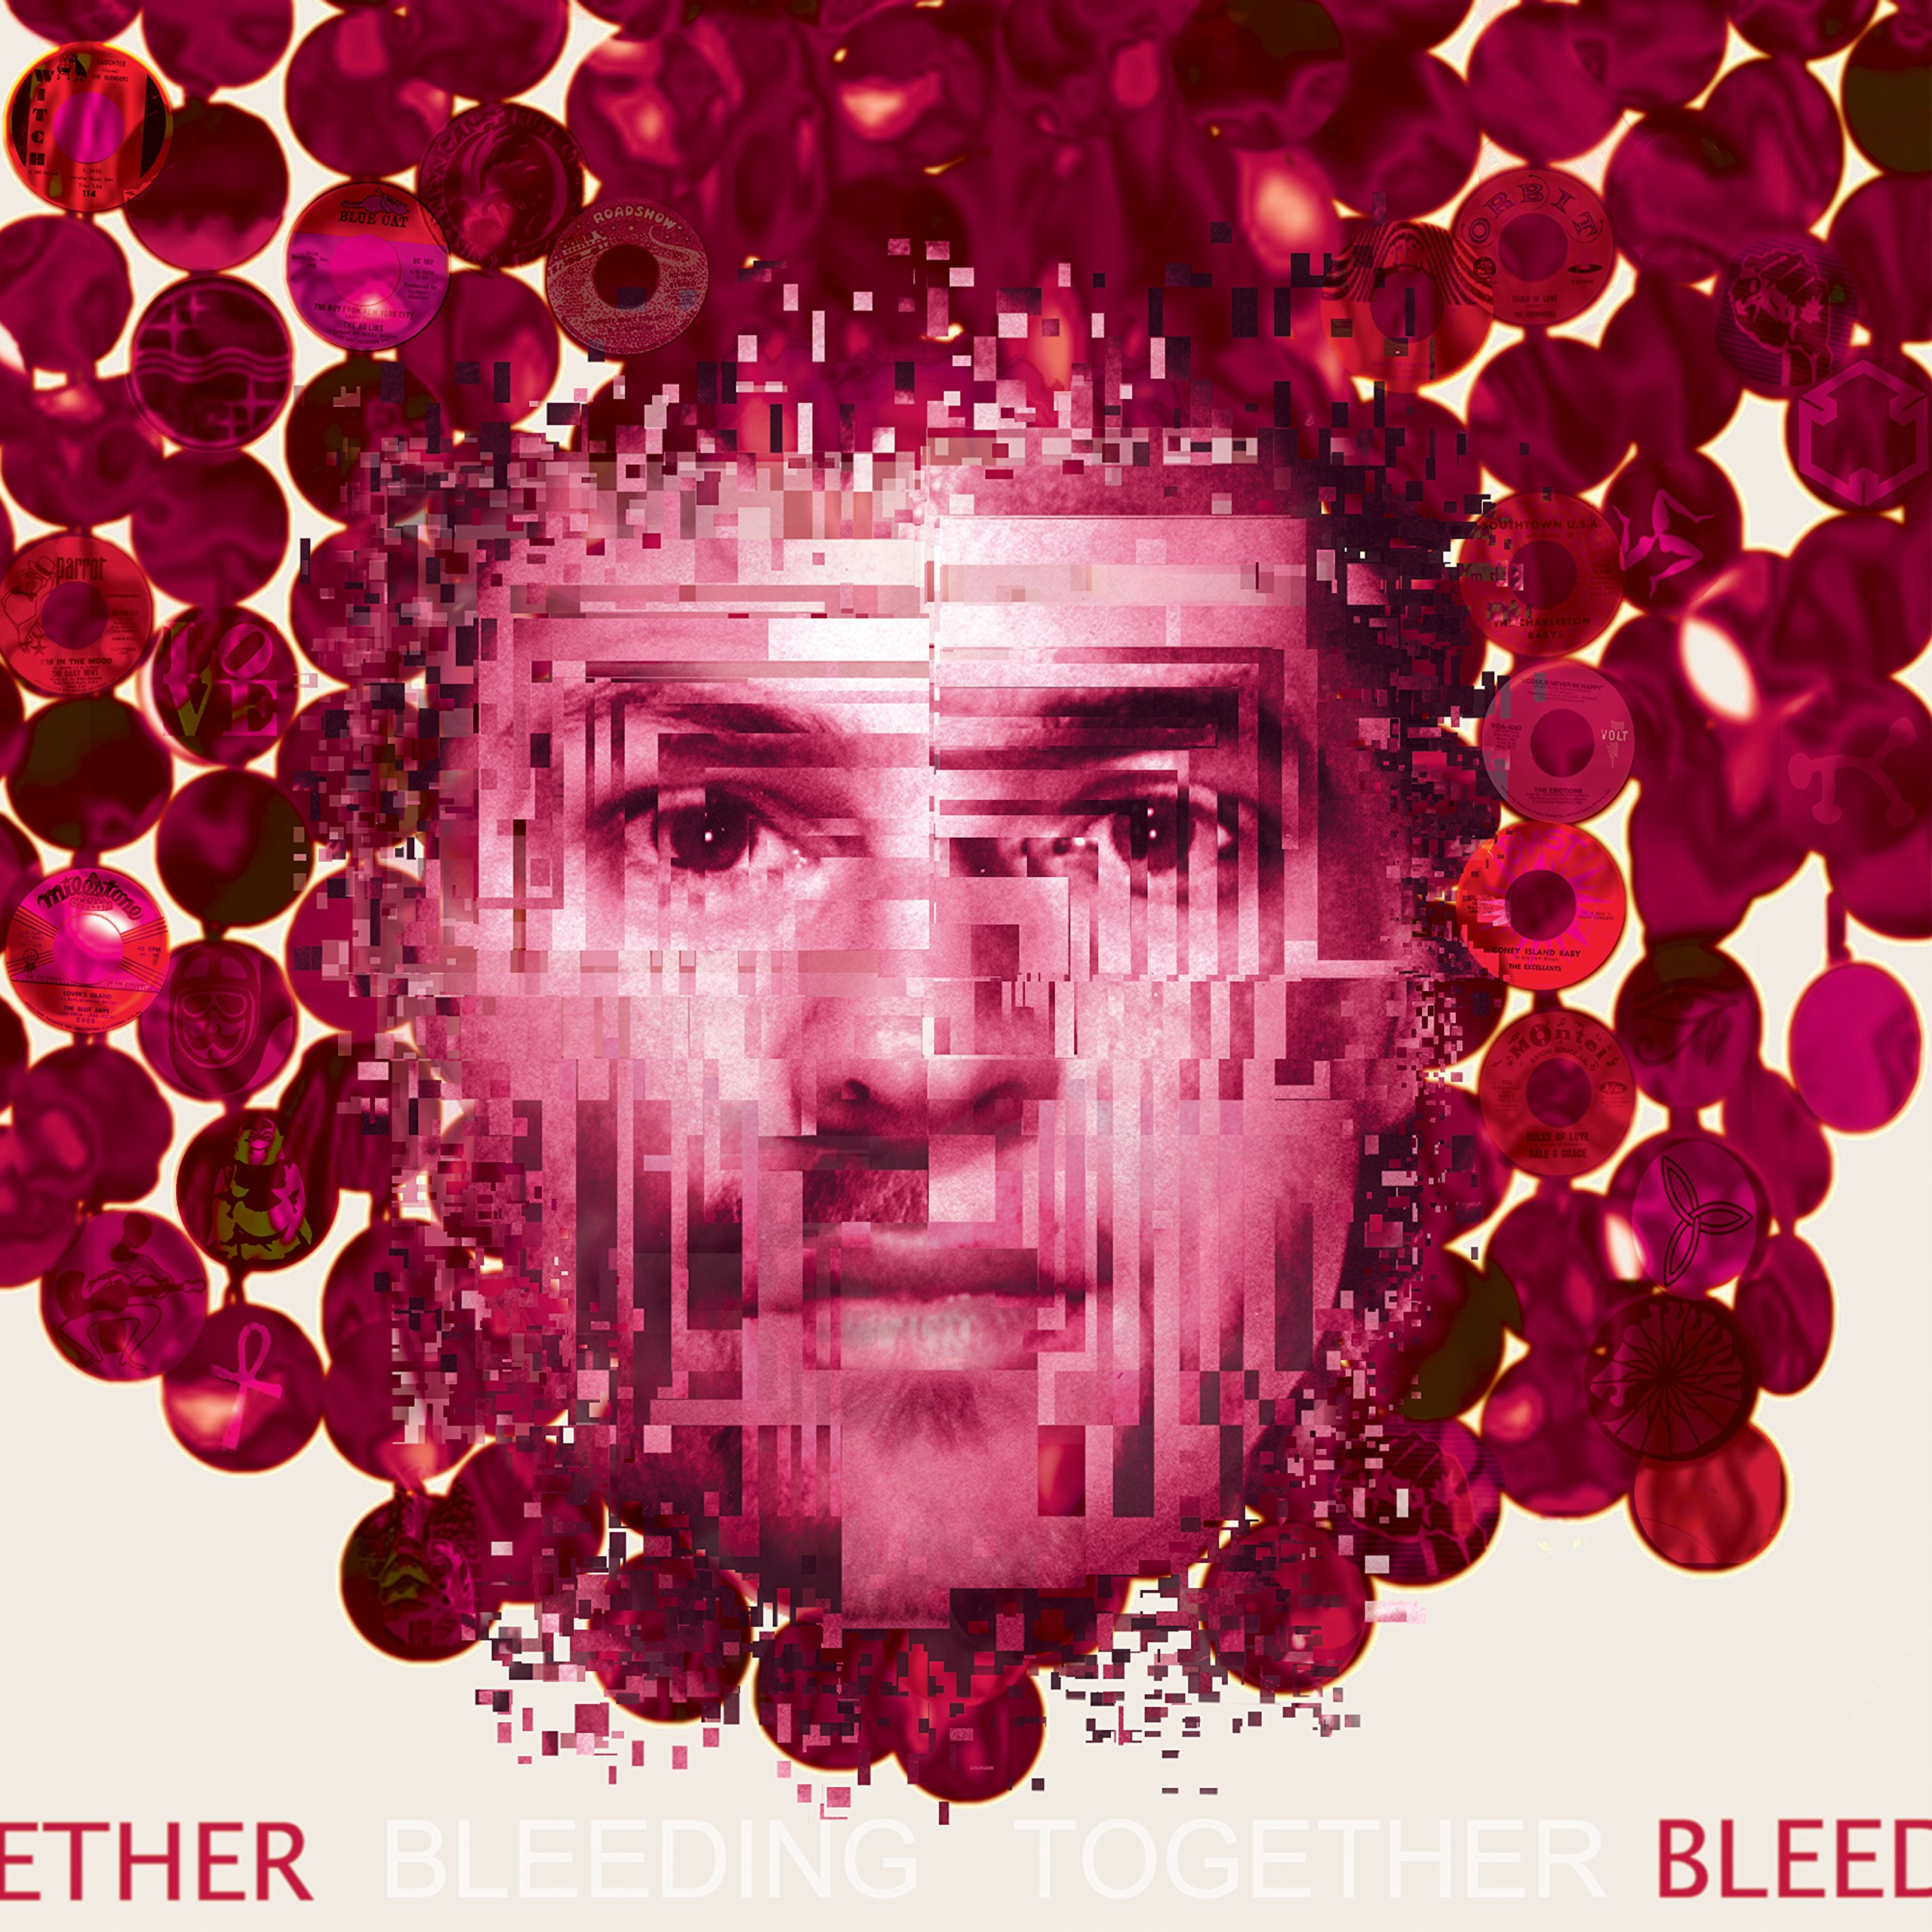 CD : dissent - Bleeding Together (CD)